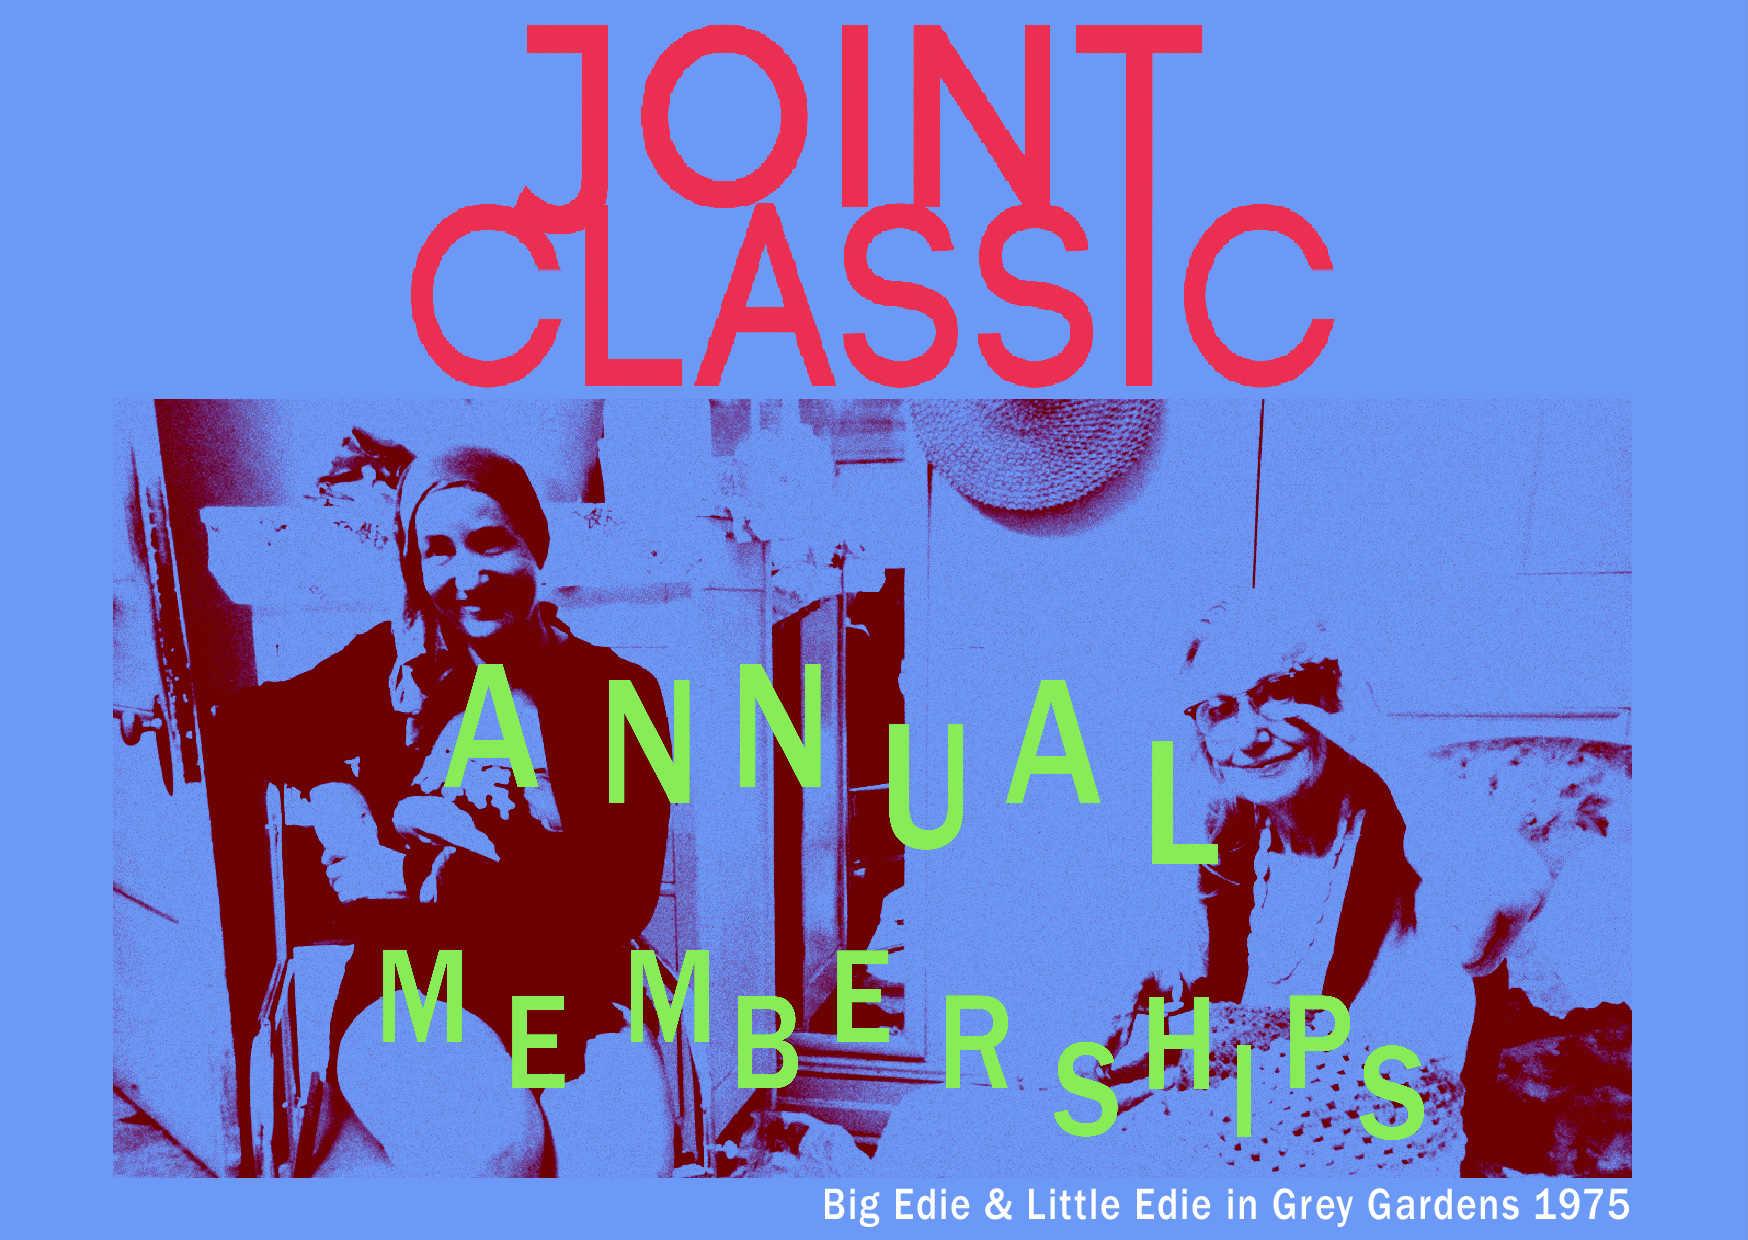 Joint Classic Membership